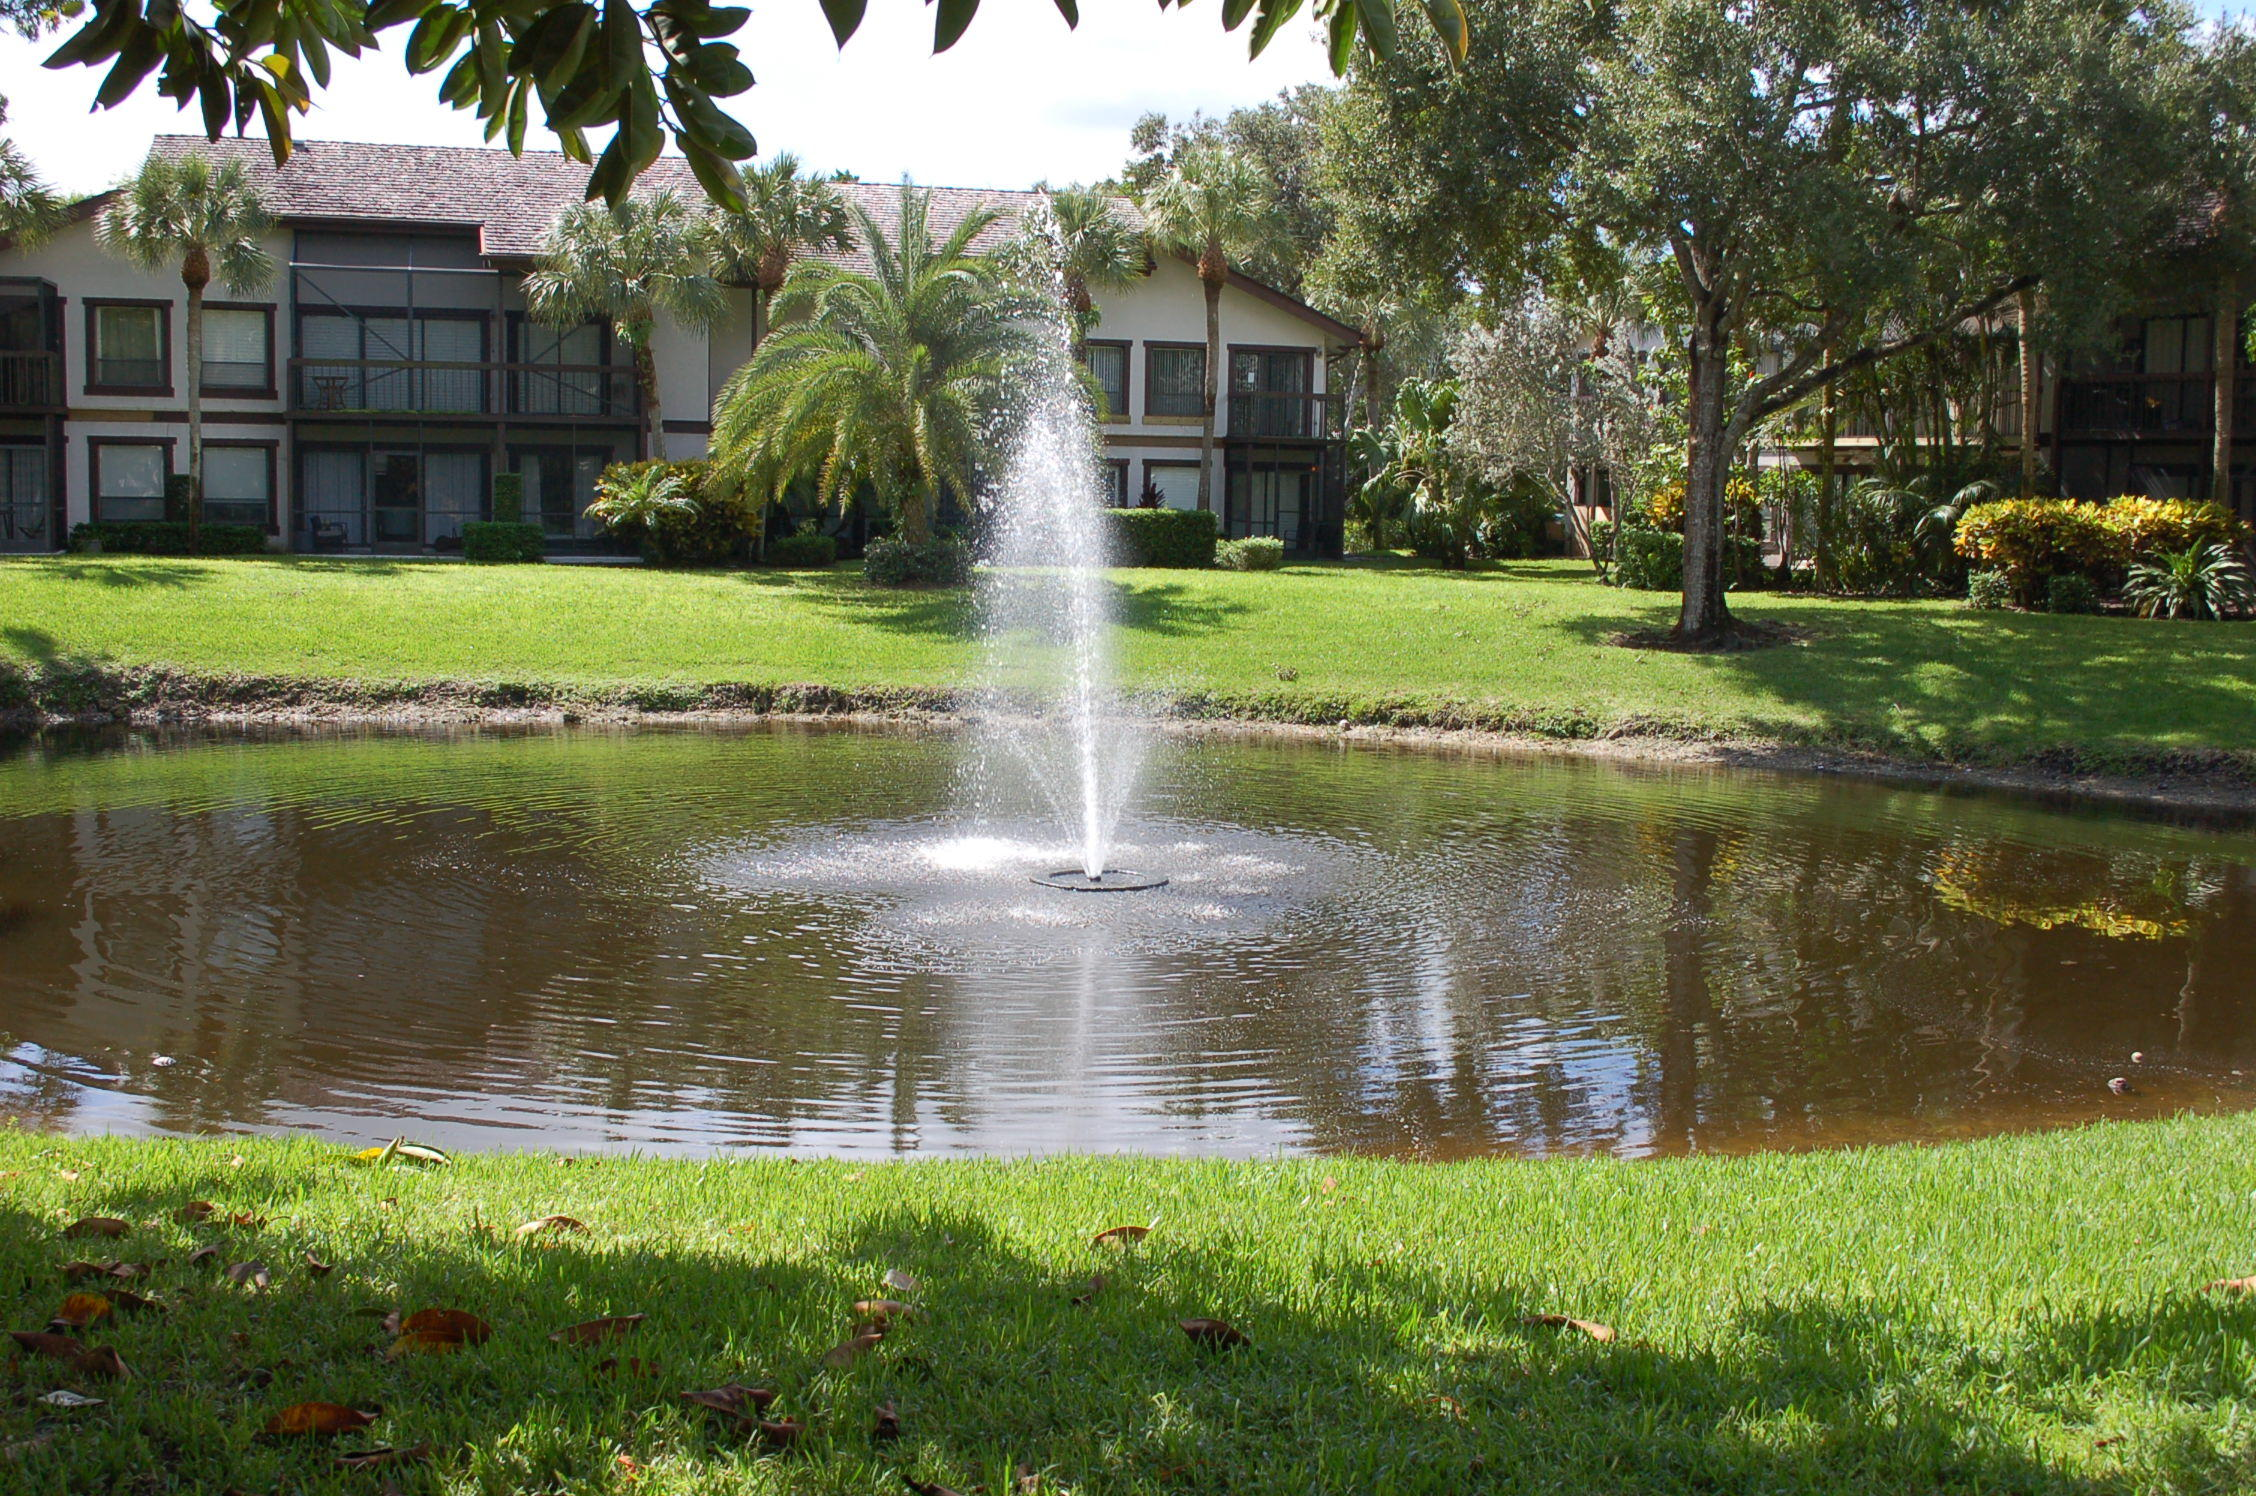 11863 Wimbledon Circle, Wellington, Florida 33414, 1 Bedroom Bedrooms, ,1 BathroomBathrooms,Condo/Coop,For Rent,Palm Beach Polo,Wimbledon Circle,1,RX-10520177